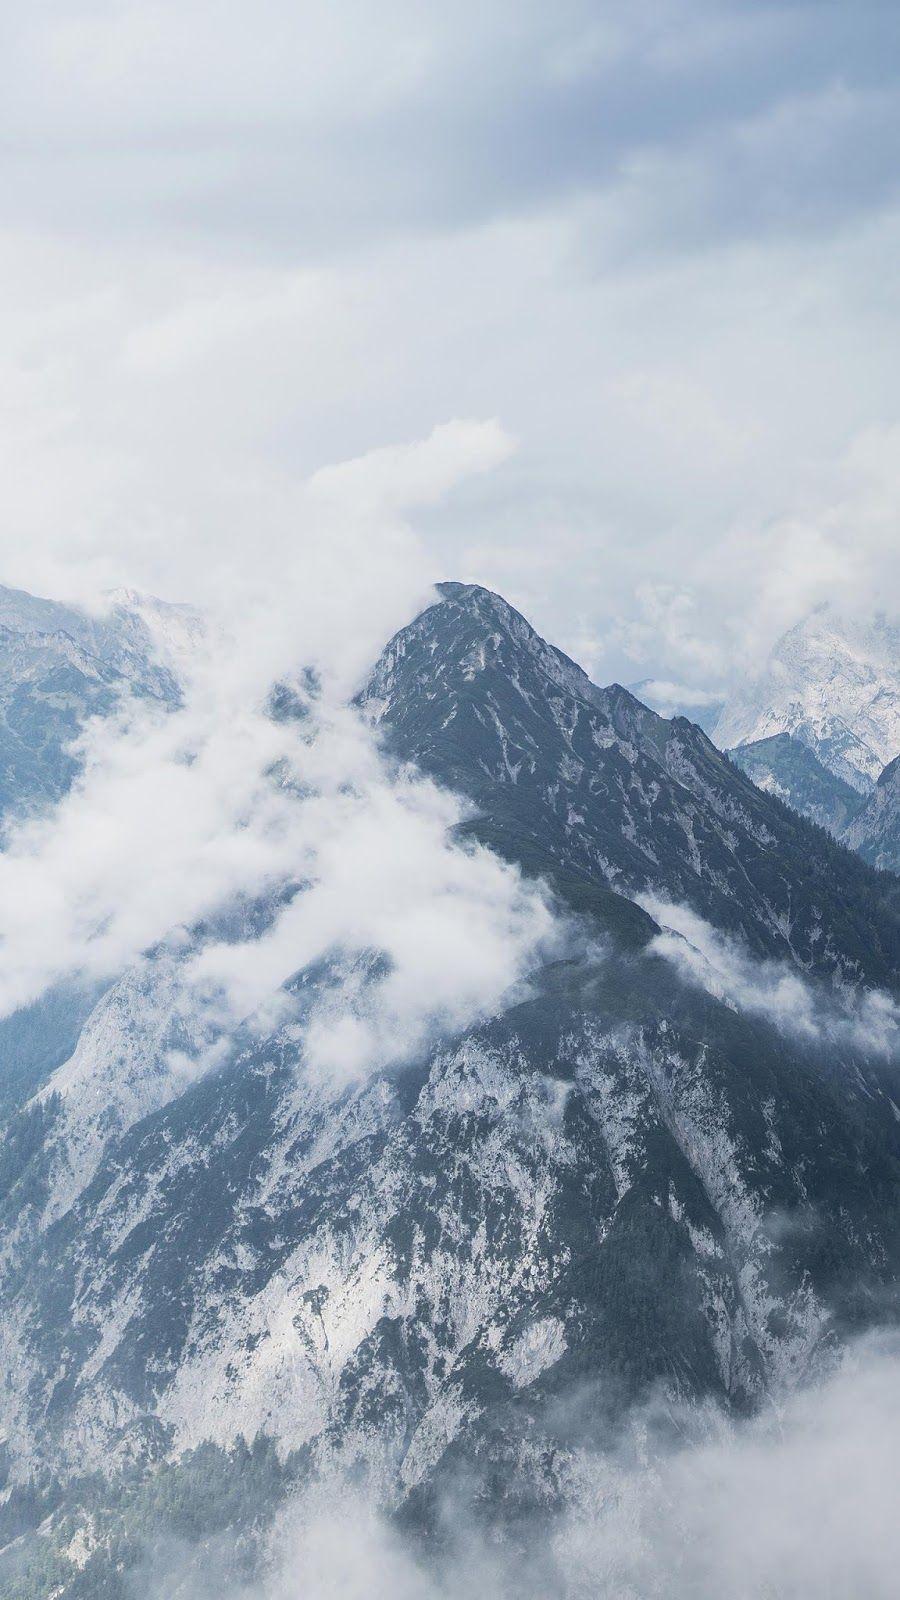 Misty Mountain Iphone Wallpaper Mountains Mountain Wallpaper Iphone Wallpaper